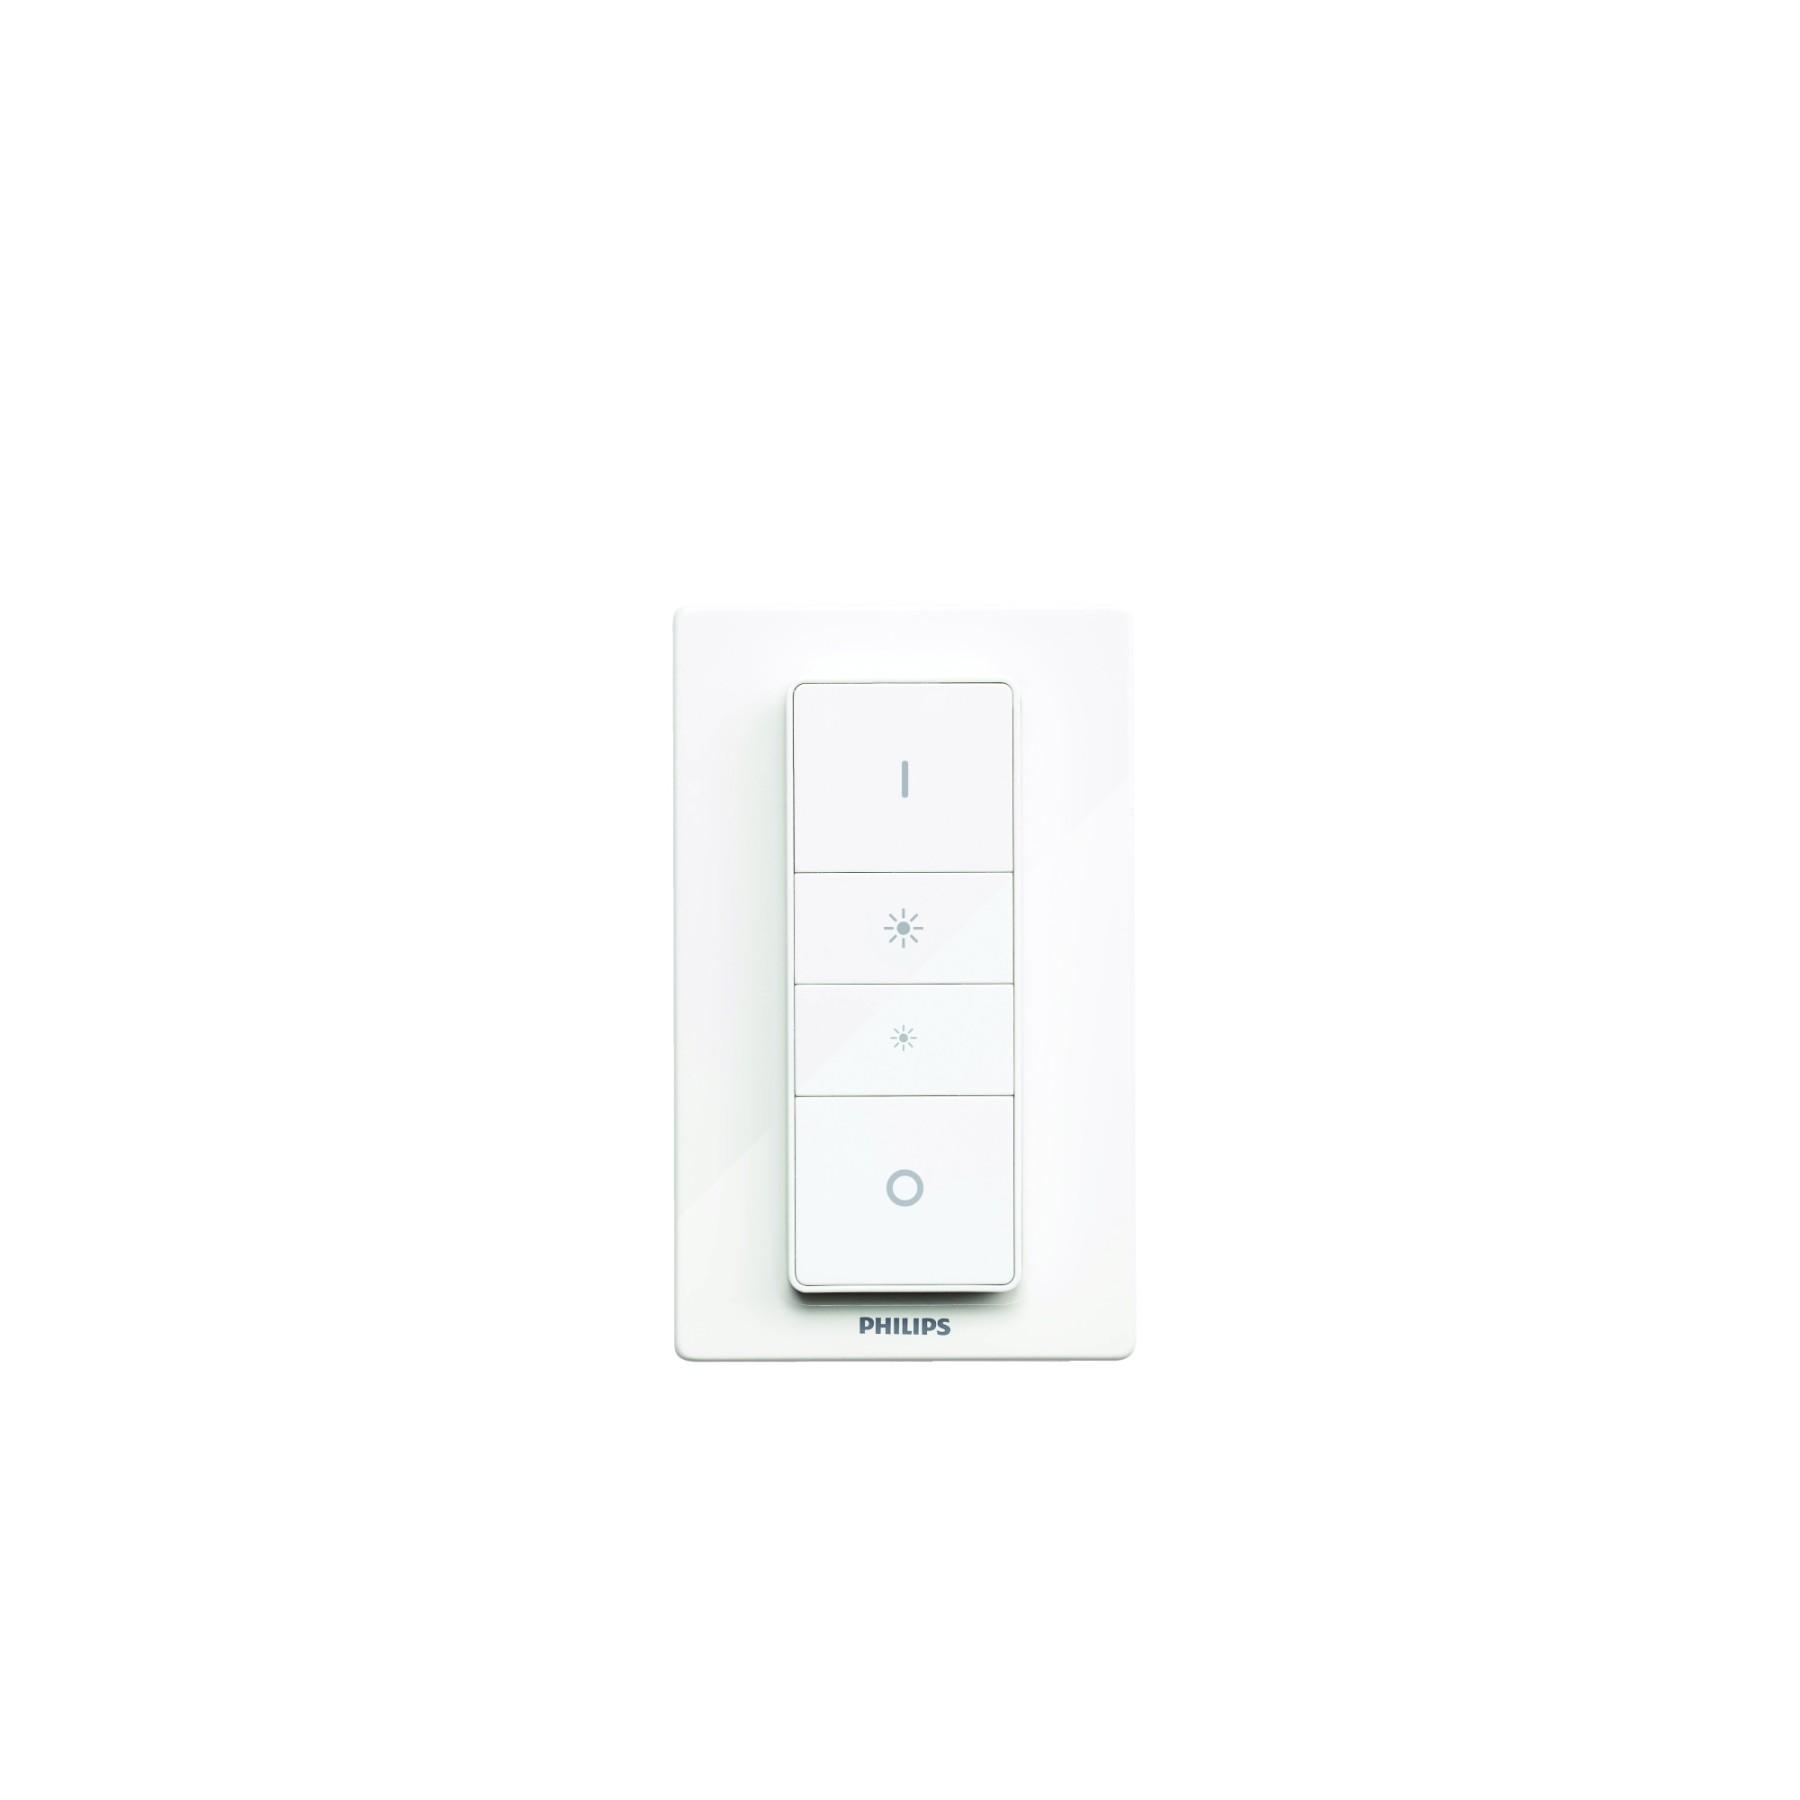 philips hue led smart light bulb and dimmer switch home. Black Bedroom Furniture Sets. Home Design Ideas